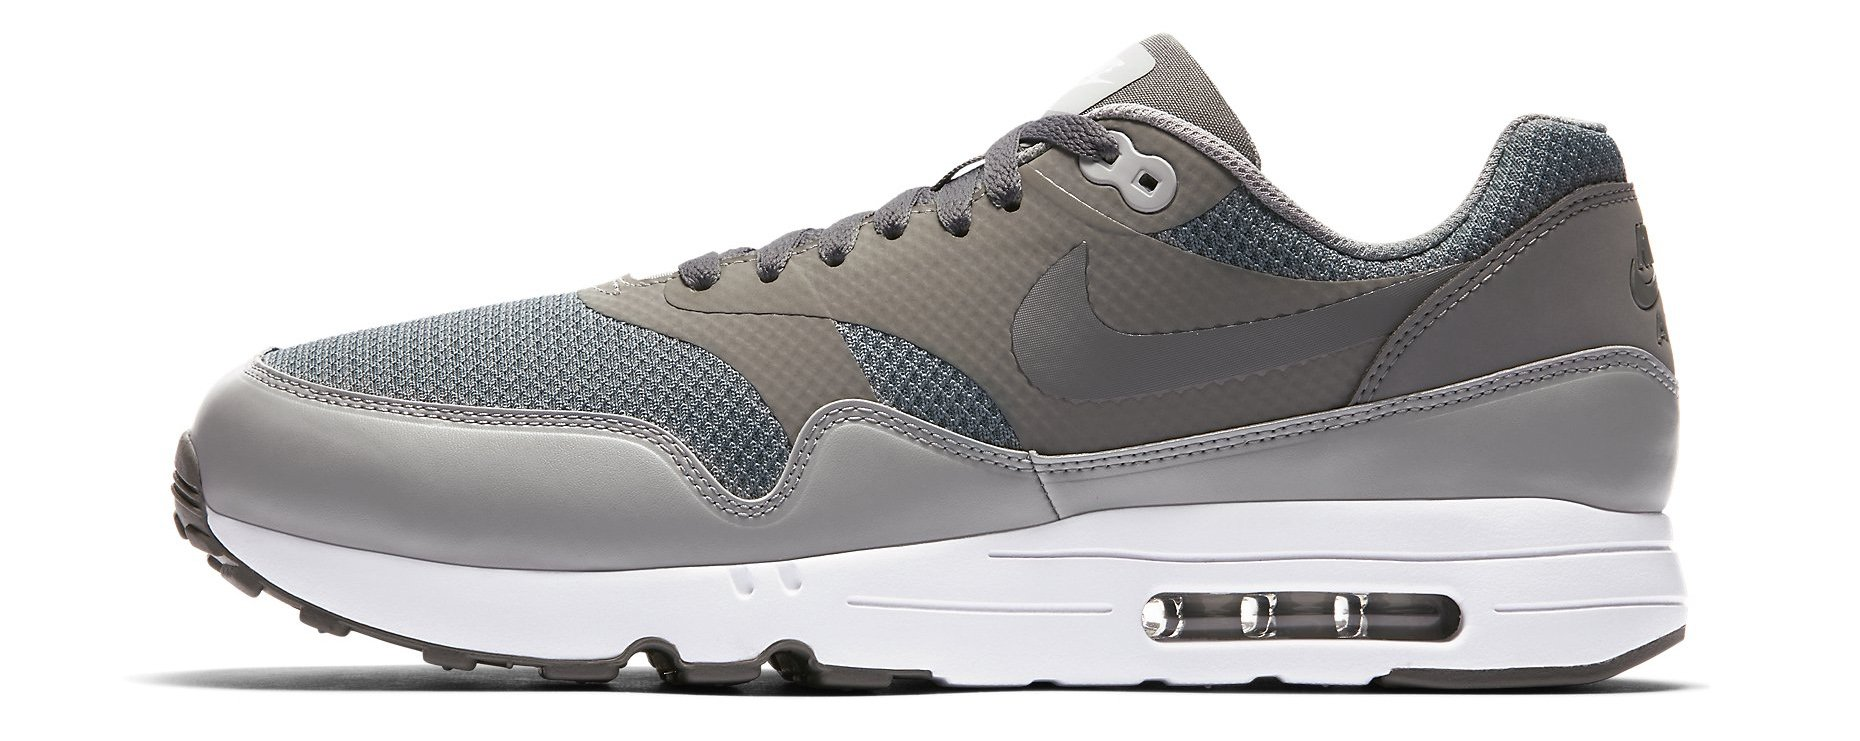 Shoes Nike AIR MAX 1 ULTRA 2.0 ESSENTIAL